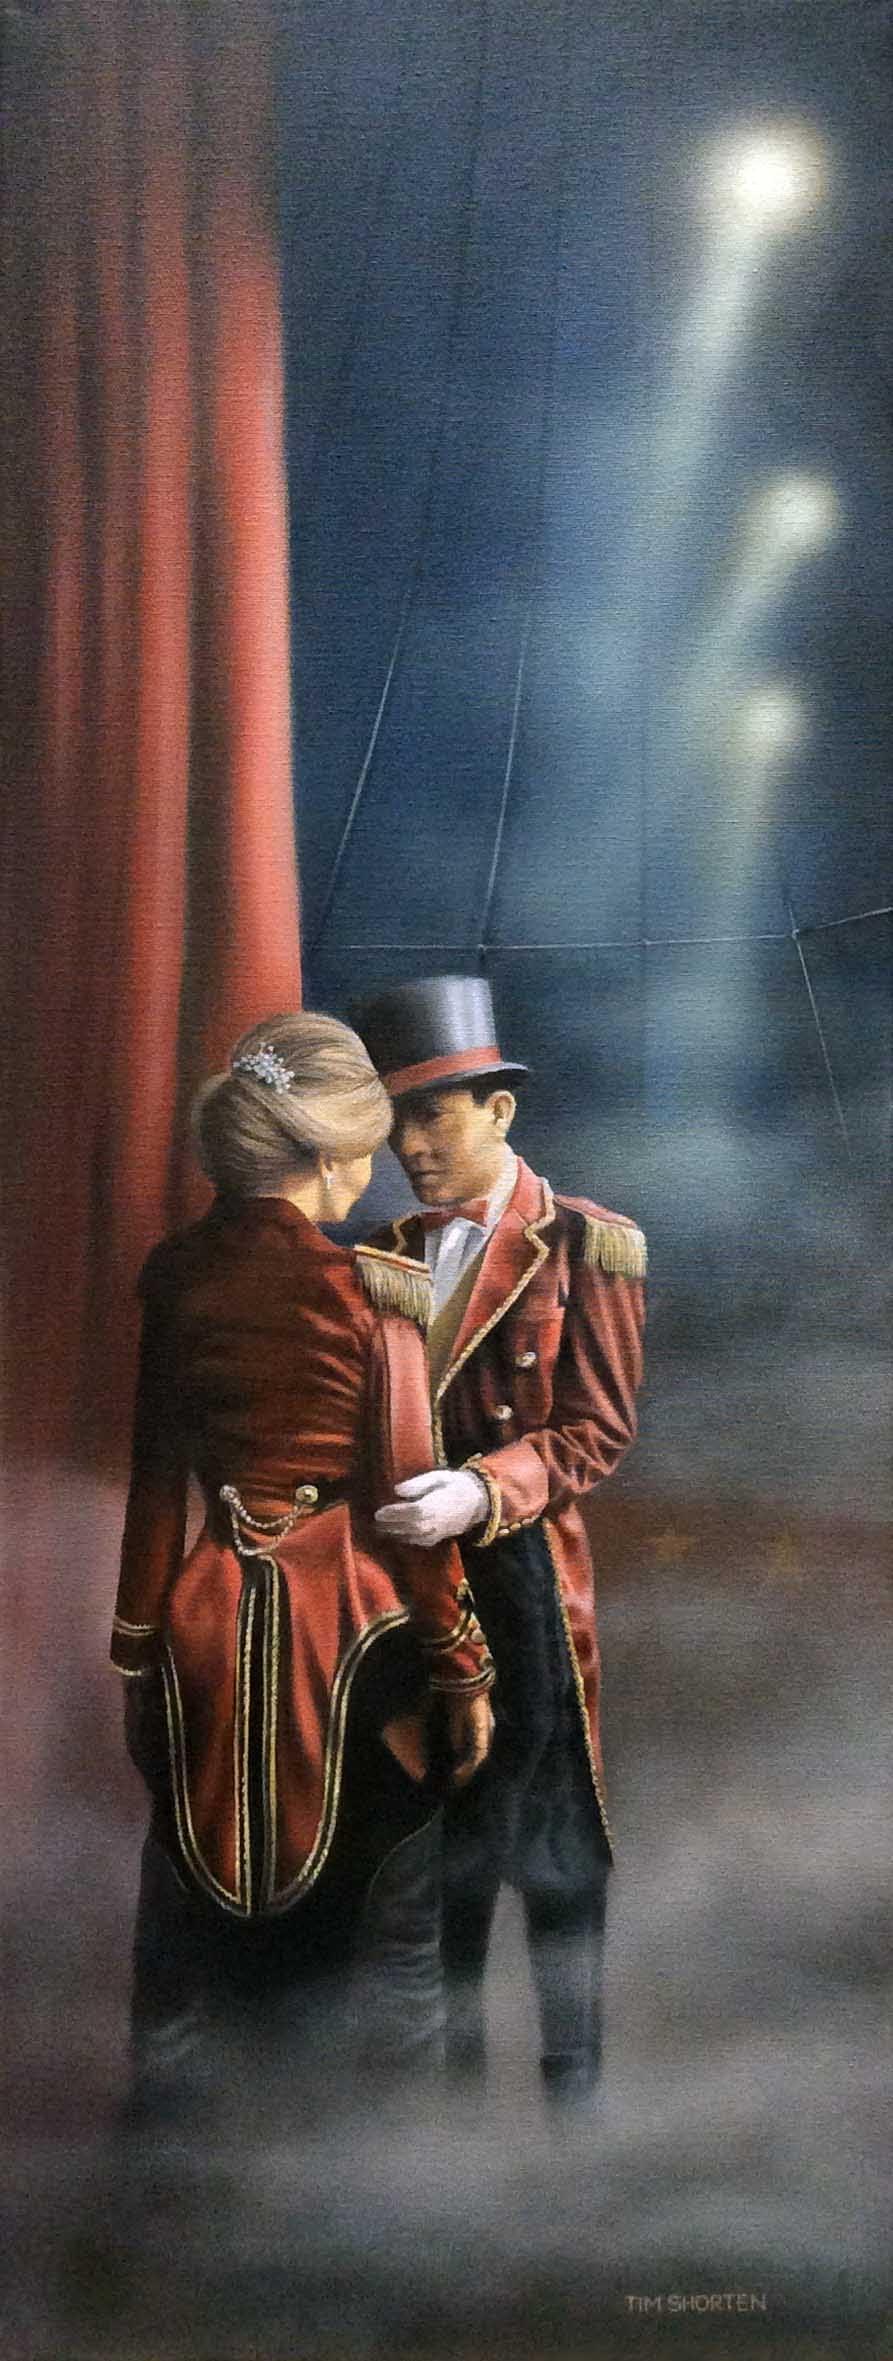 Tim Shorten Circus